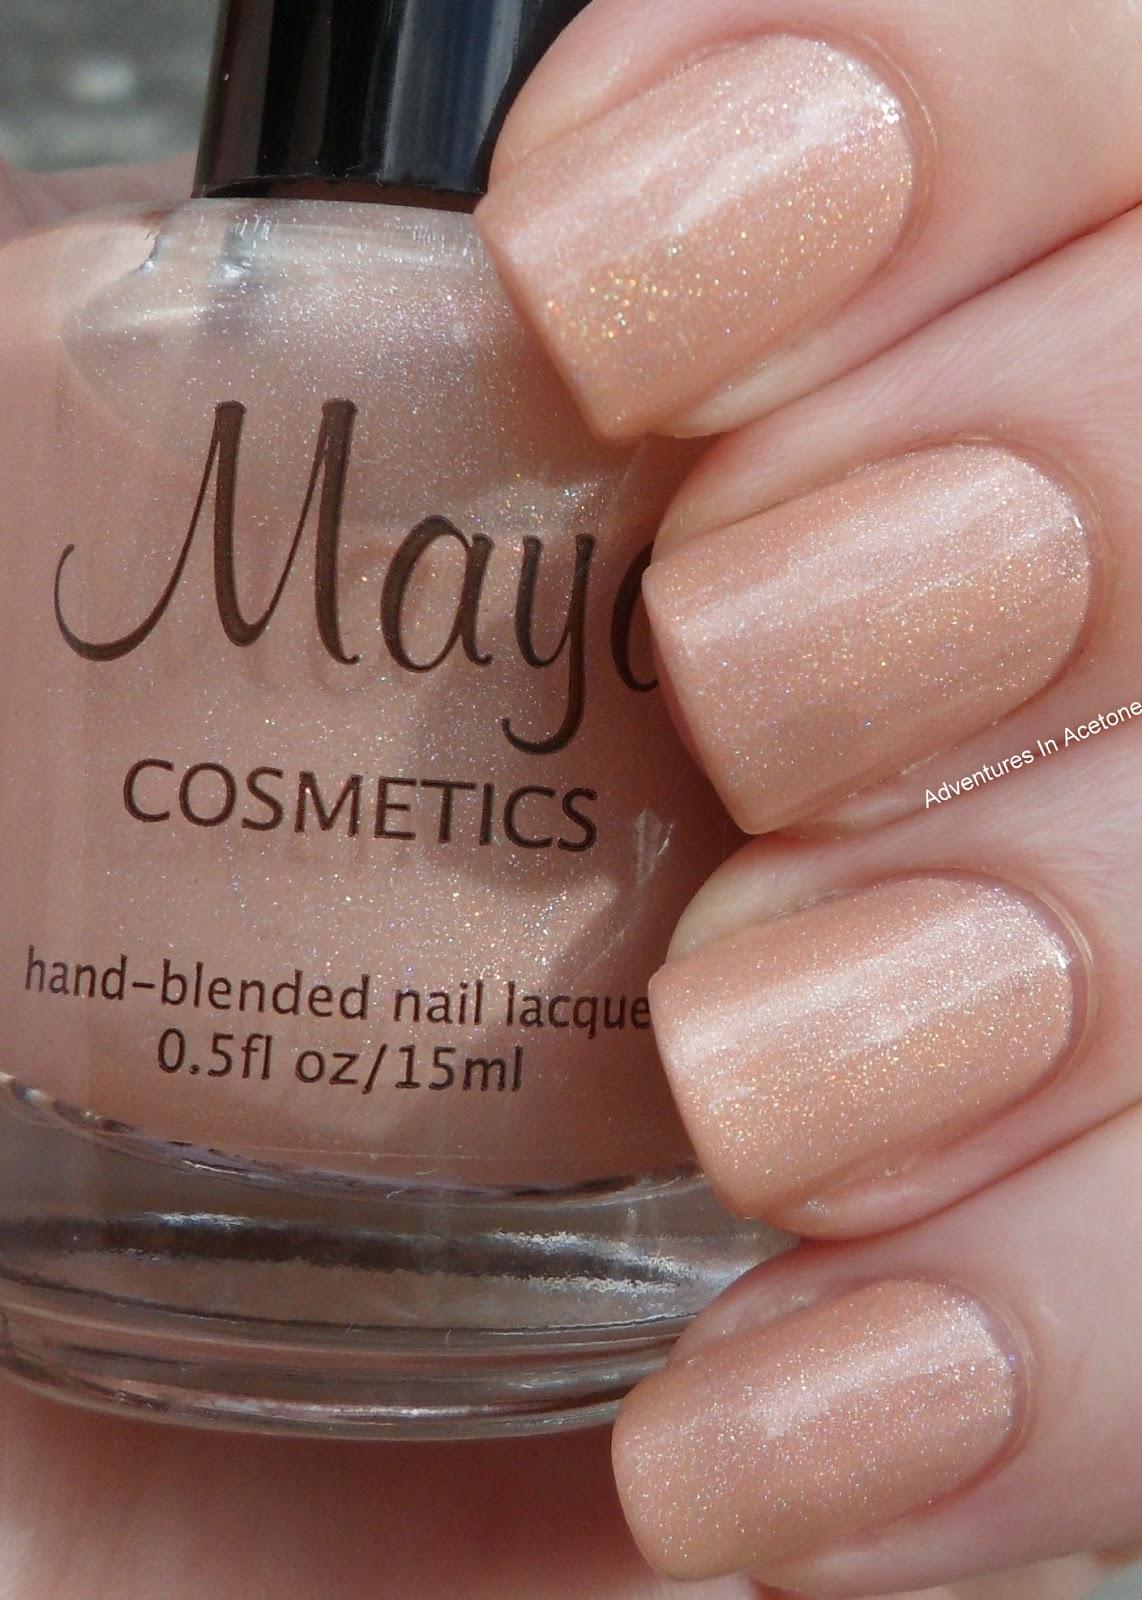 New Maya Cosmetics Polish Swatches! - Adventures In Acetone